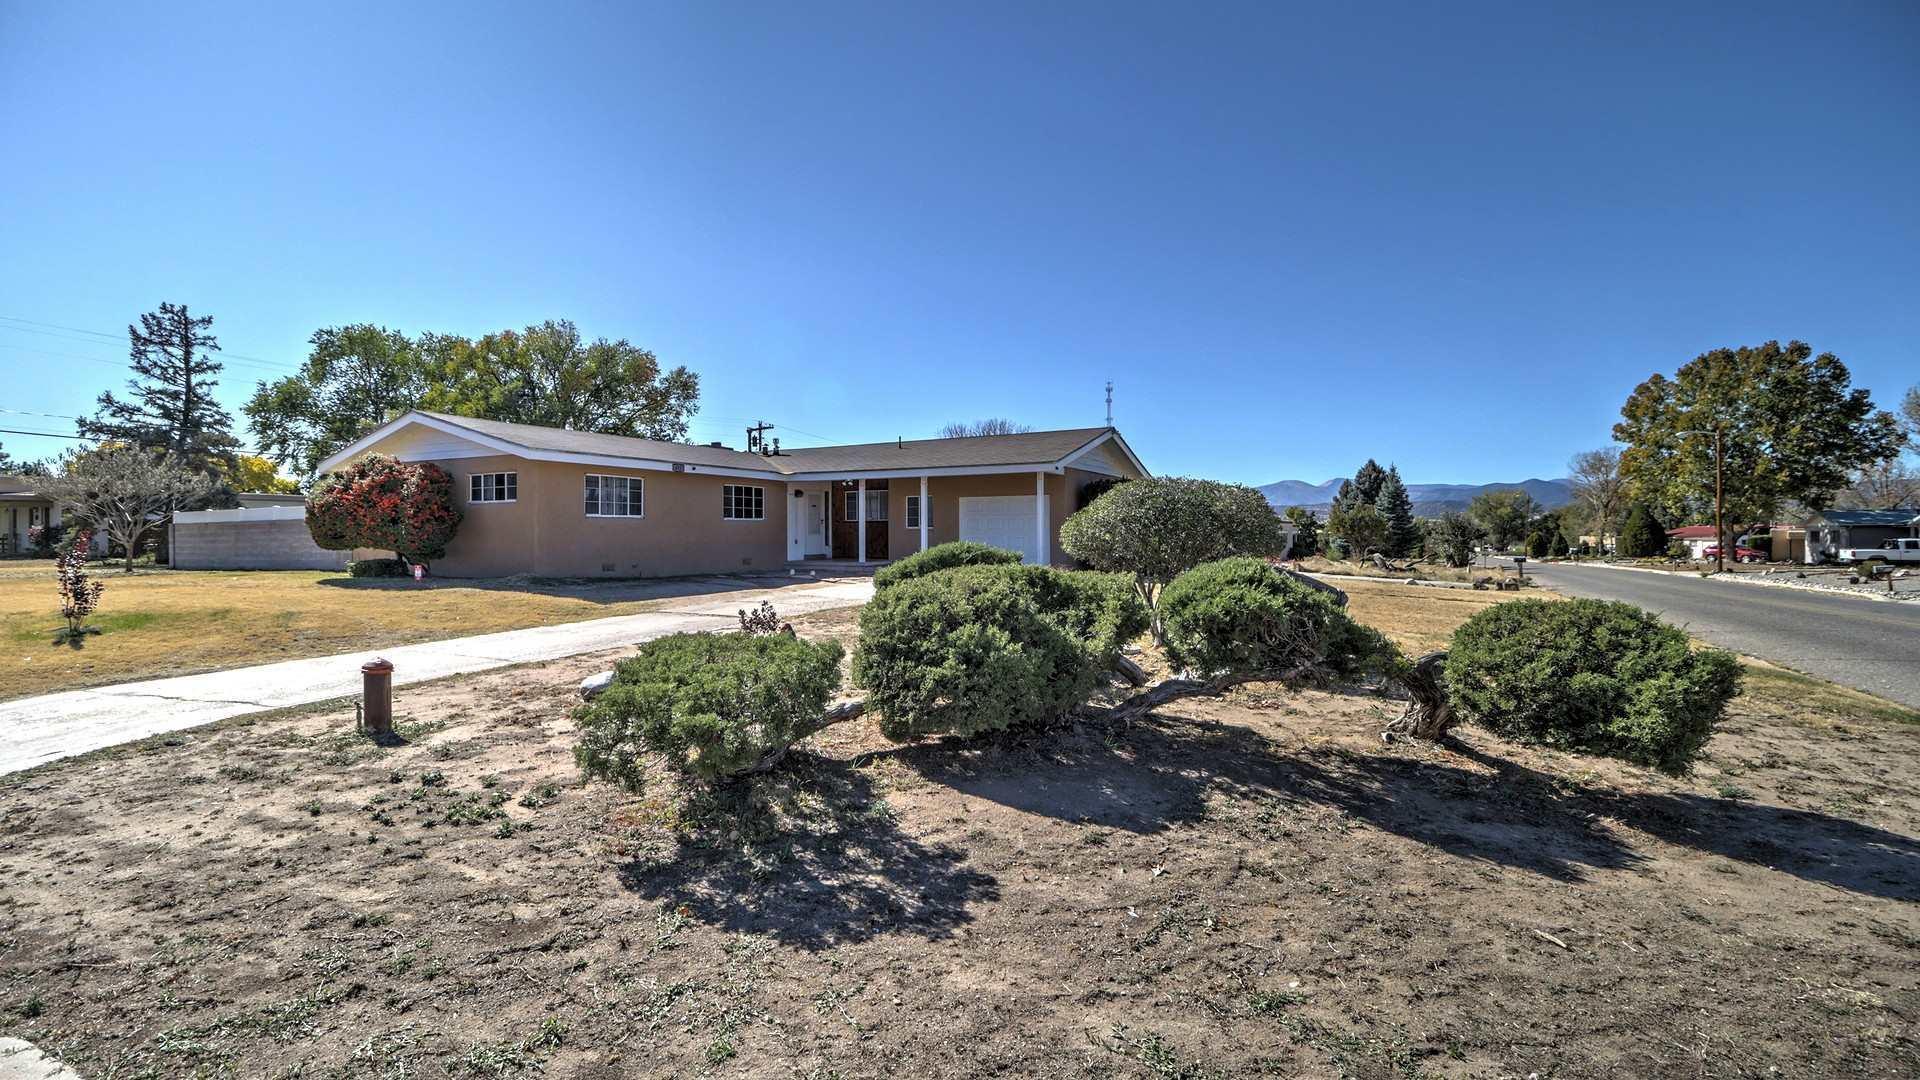 612 Valley Drive Drive, Espanola, NM 87532 - Espanola, NM real estate listing